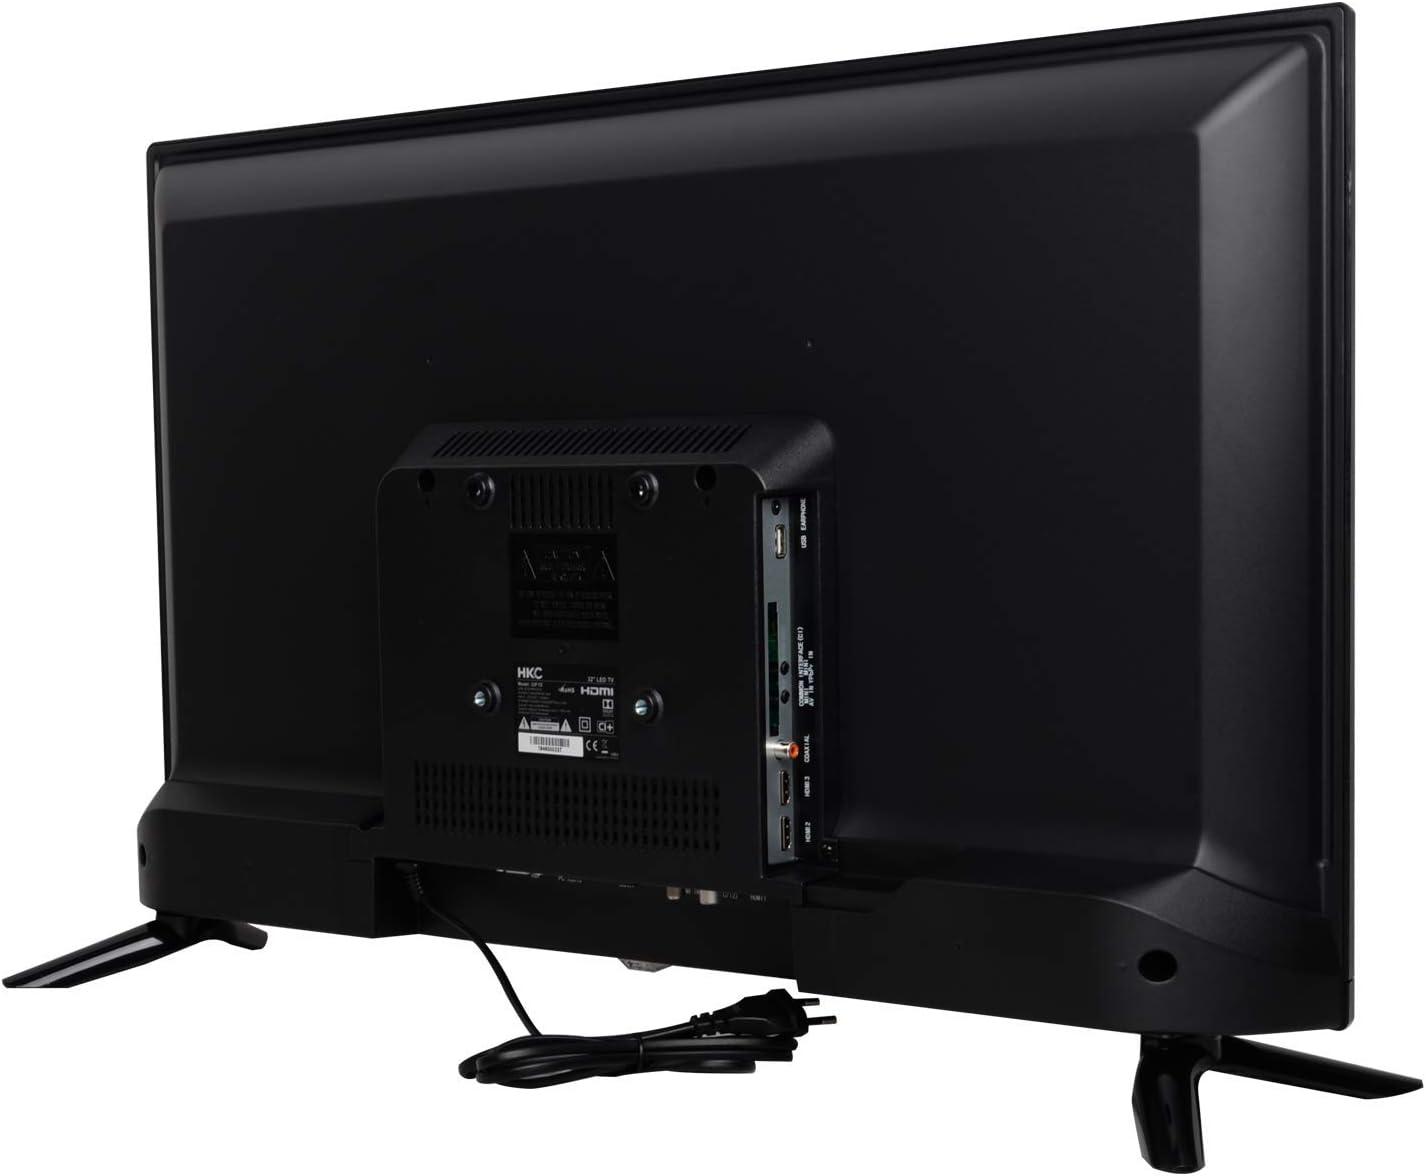 HKC 32F1D LED TV (32 Pulgadas HD TV), Ci+, HDMI+USB, Triple Tuner, 60Hz, Mediaplayer